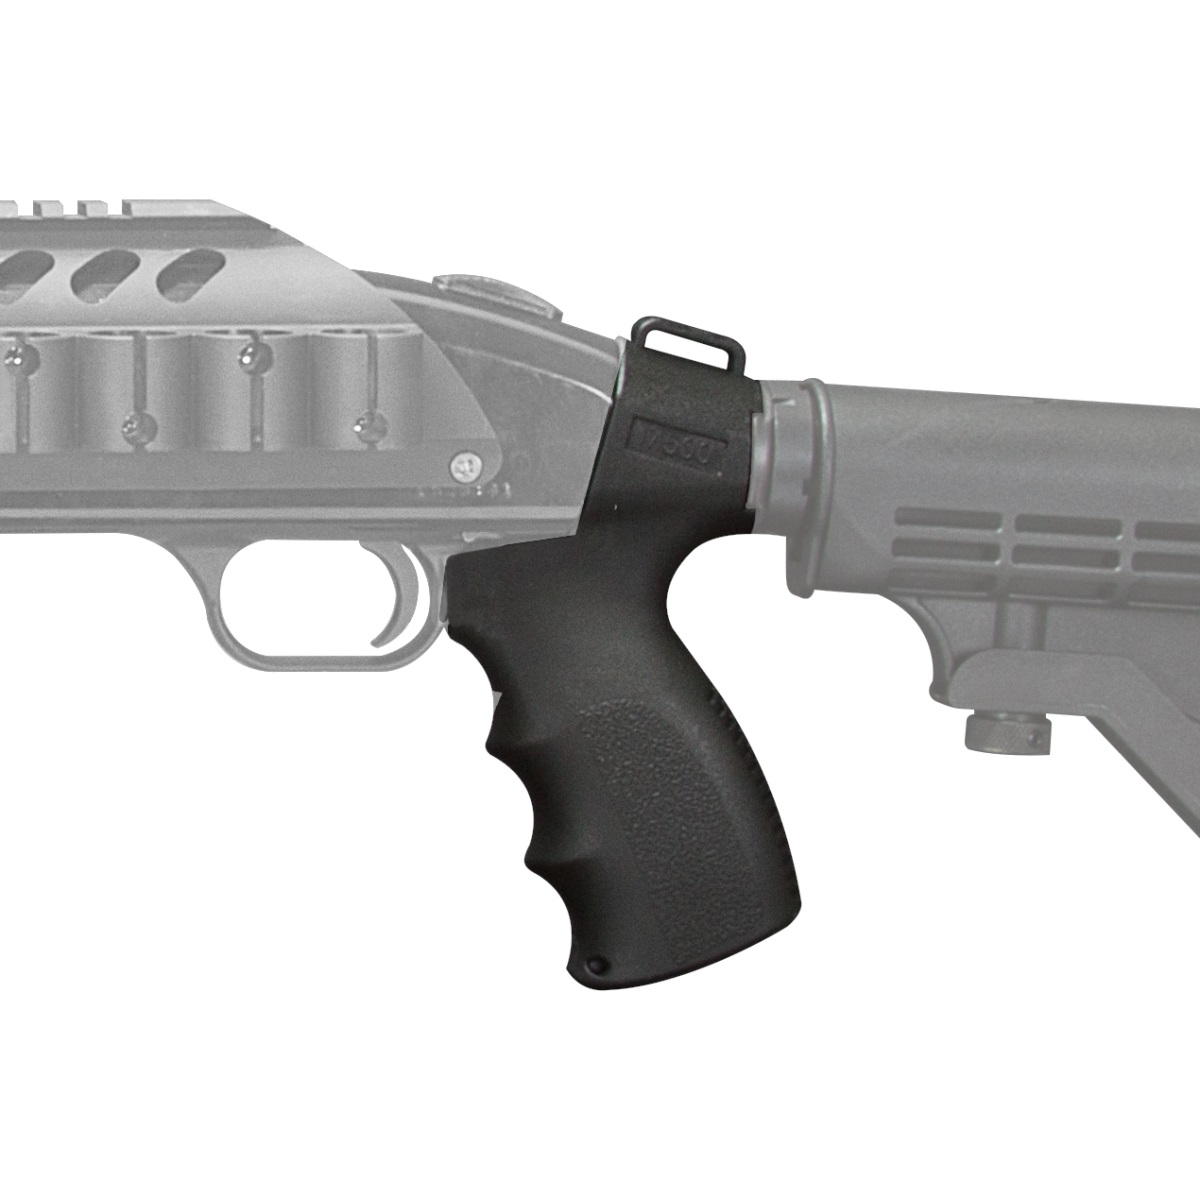 Aim Sports Inc Mossberg 500 Shotgun Pistol Grip 40 Off Free Shipping Over 49